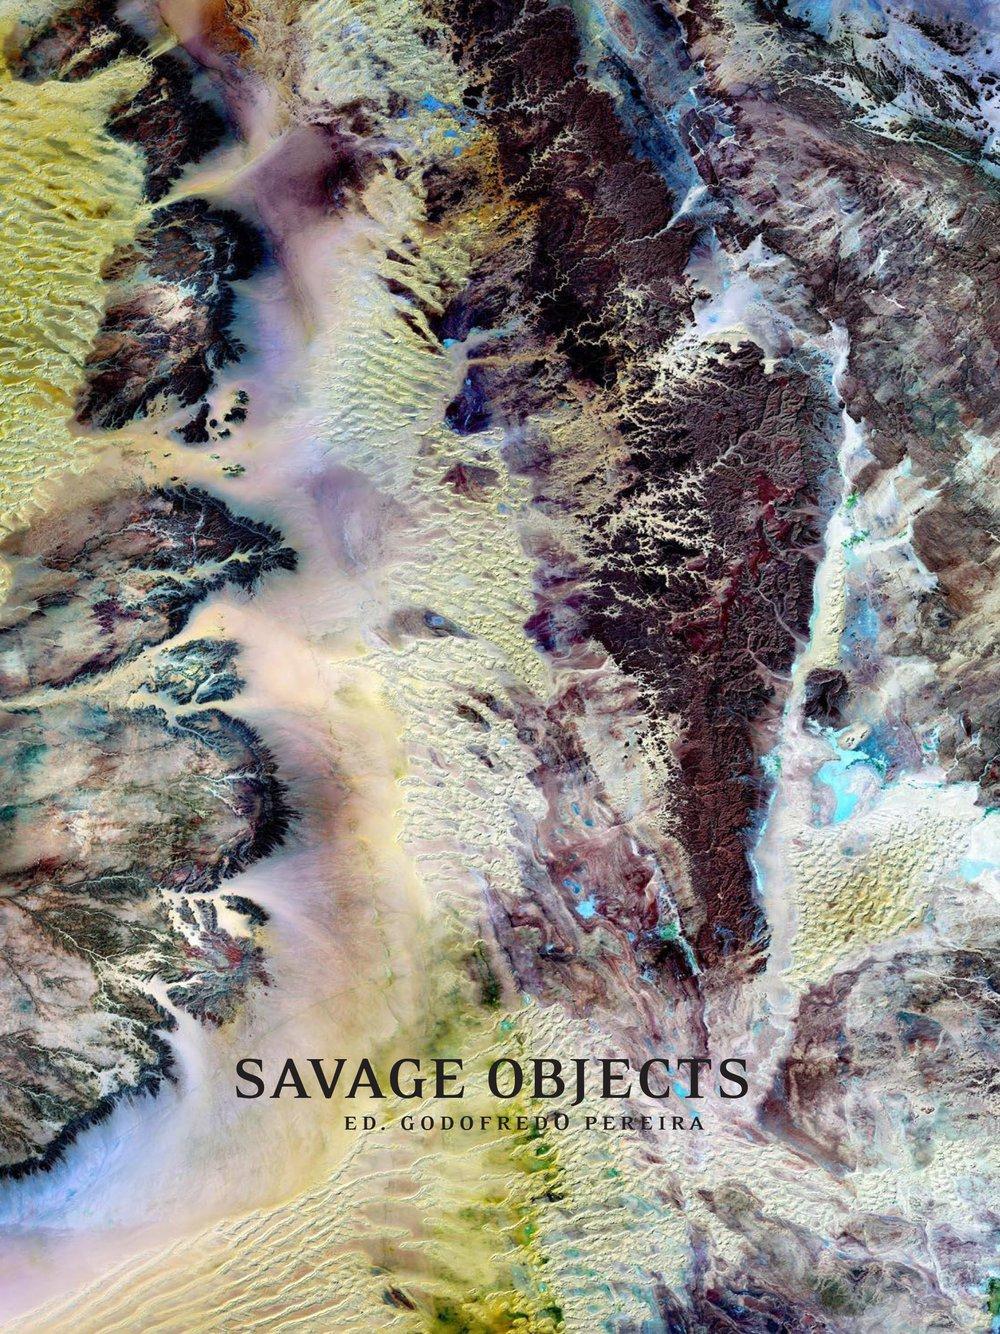 Savage Objects, INCM, 2012